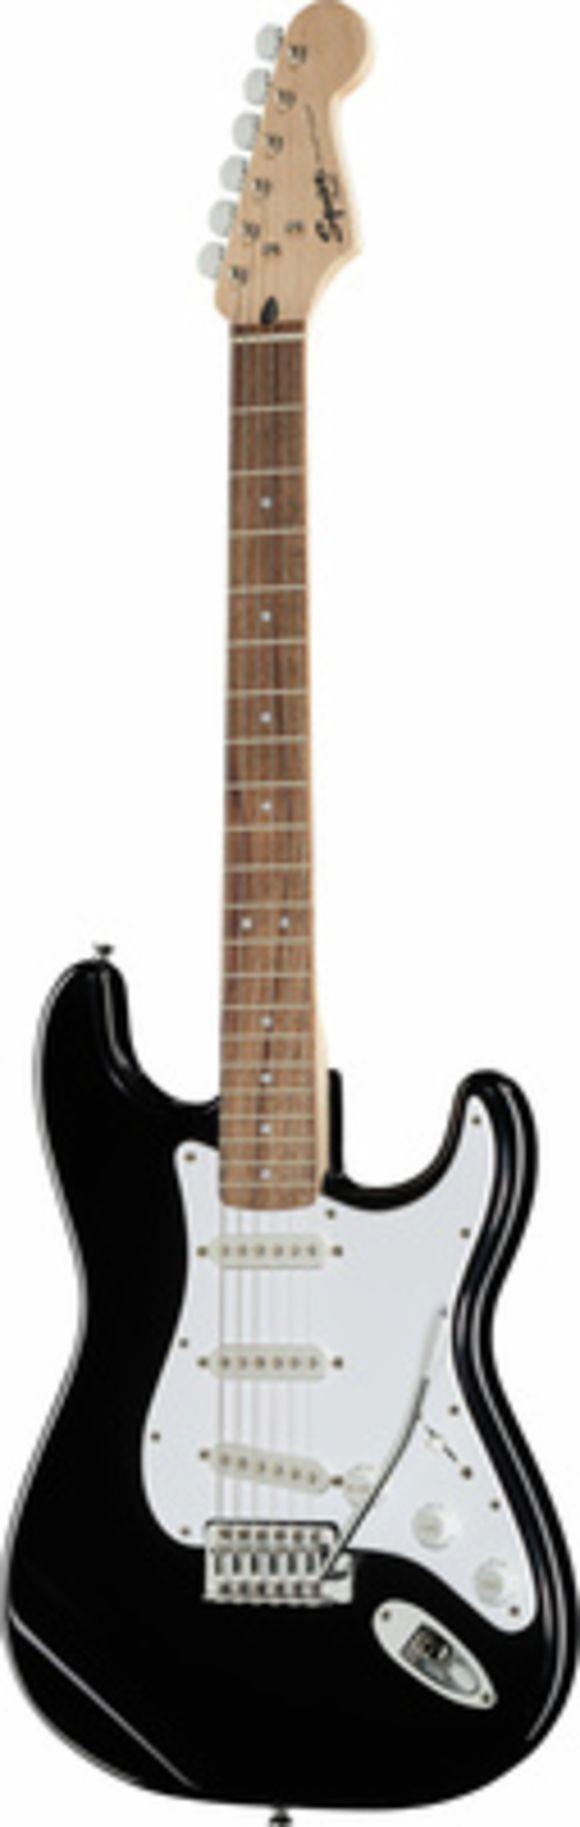 Squier Bullet Strat BK Fender